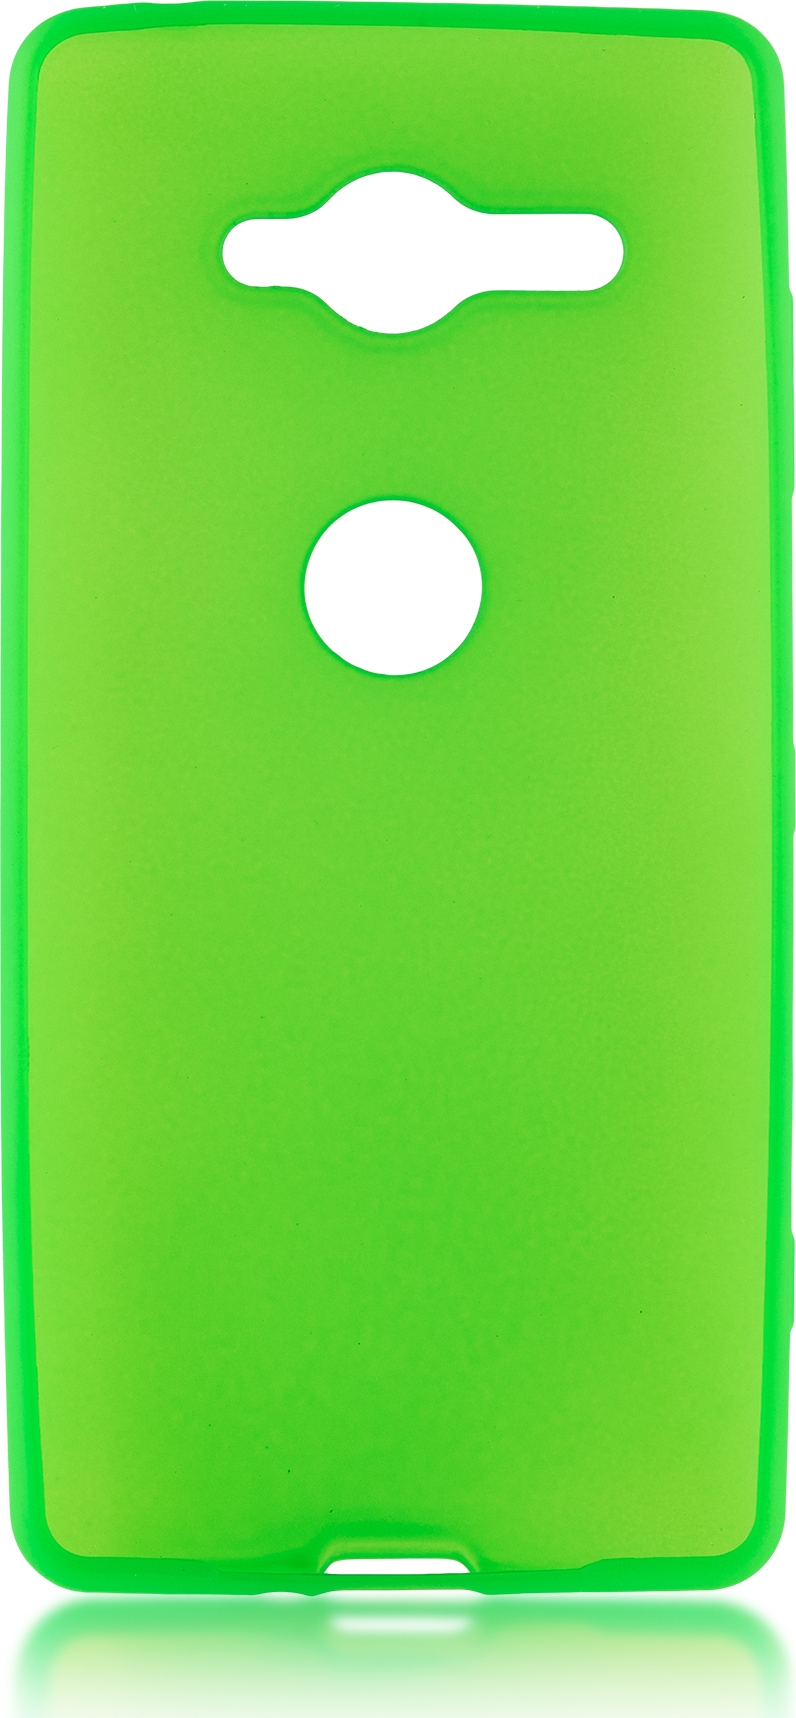 Чехол Brosco Colourful для Sony Xperia XZ2 Compact, зеленый аксессуар чехол для sony xperia xz2 compact brosco transparent xz2c tpu transparent